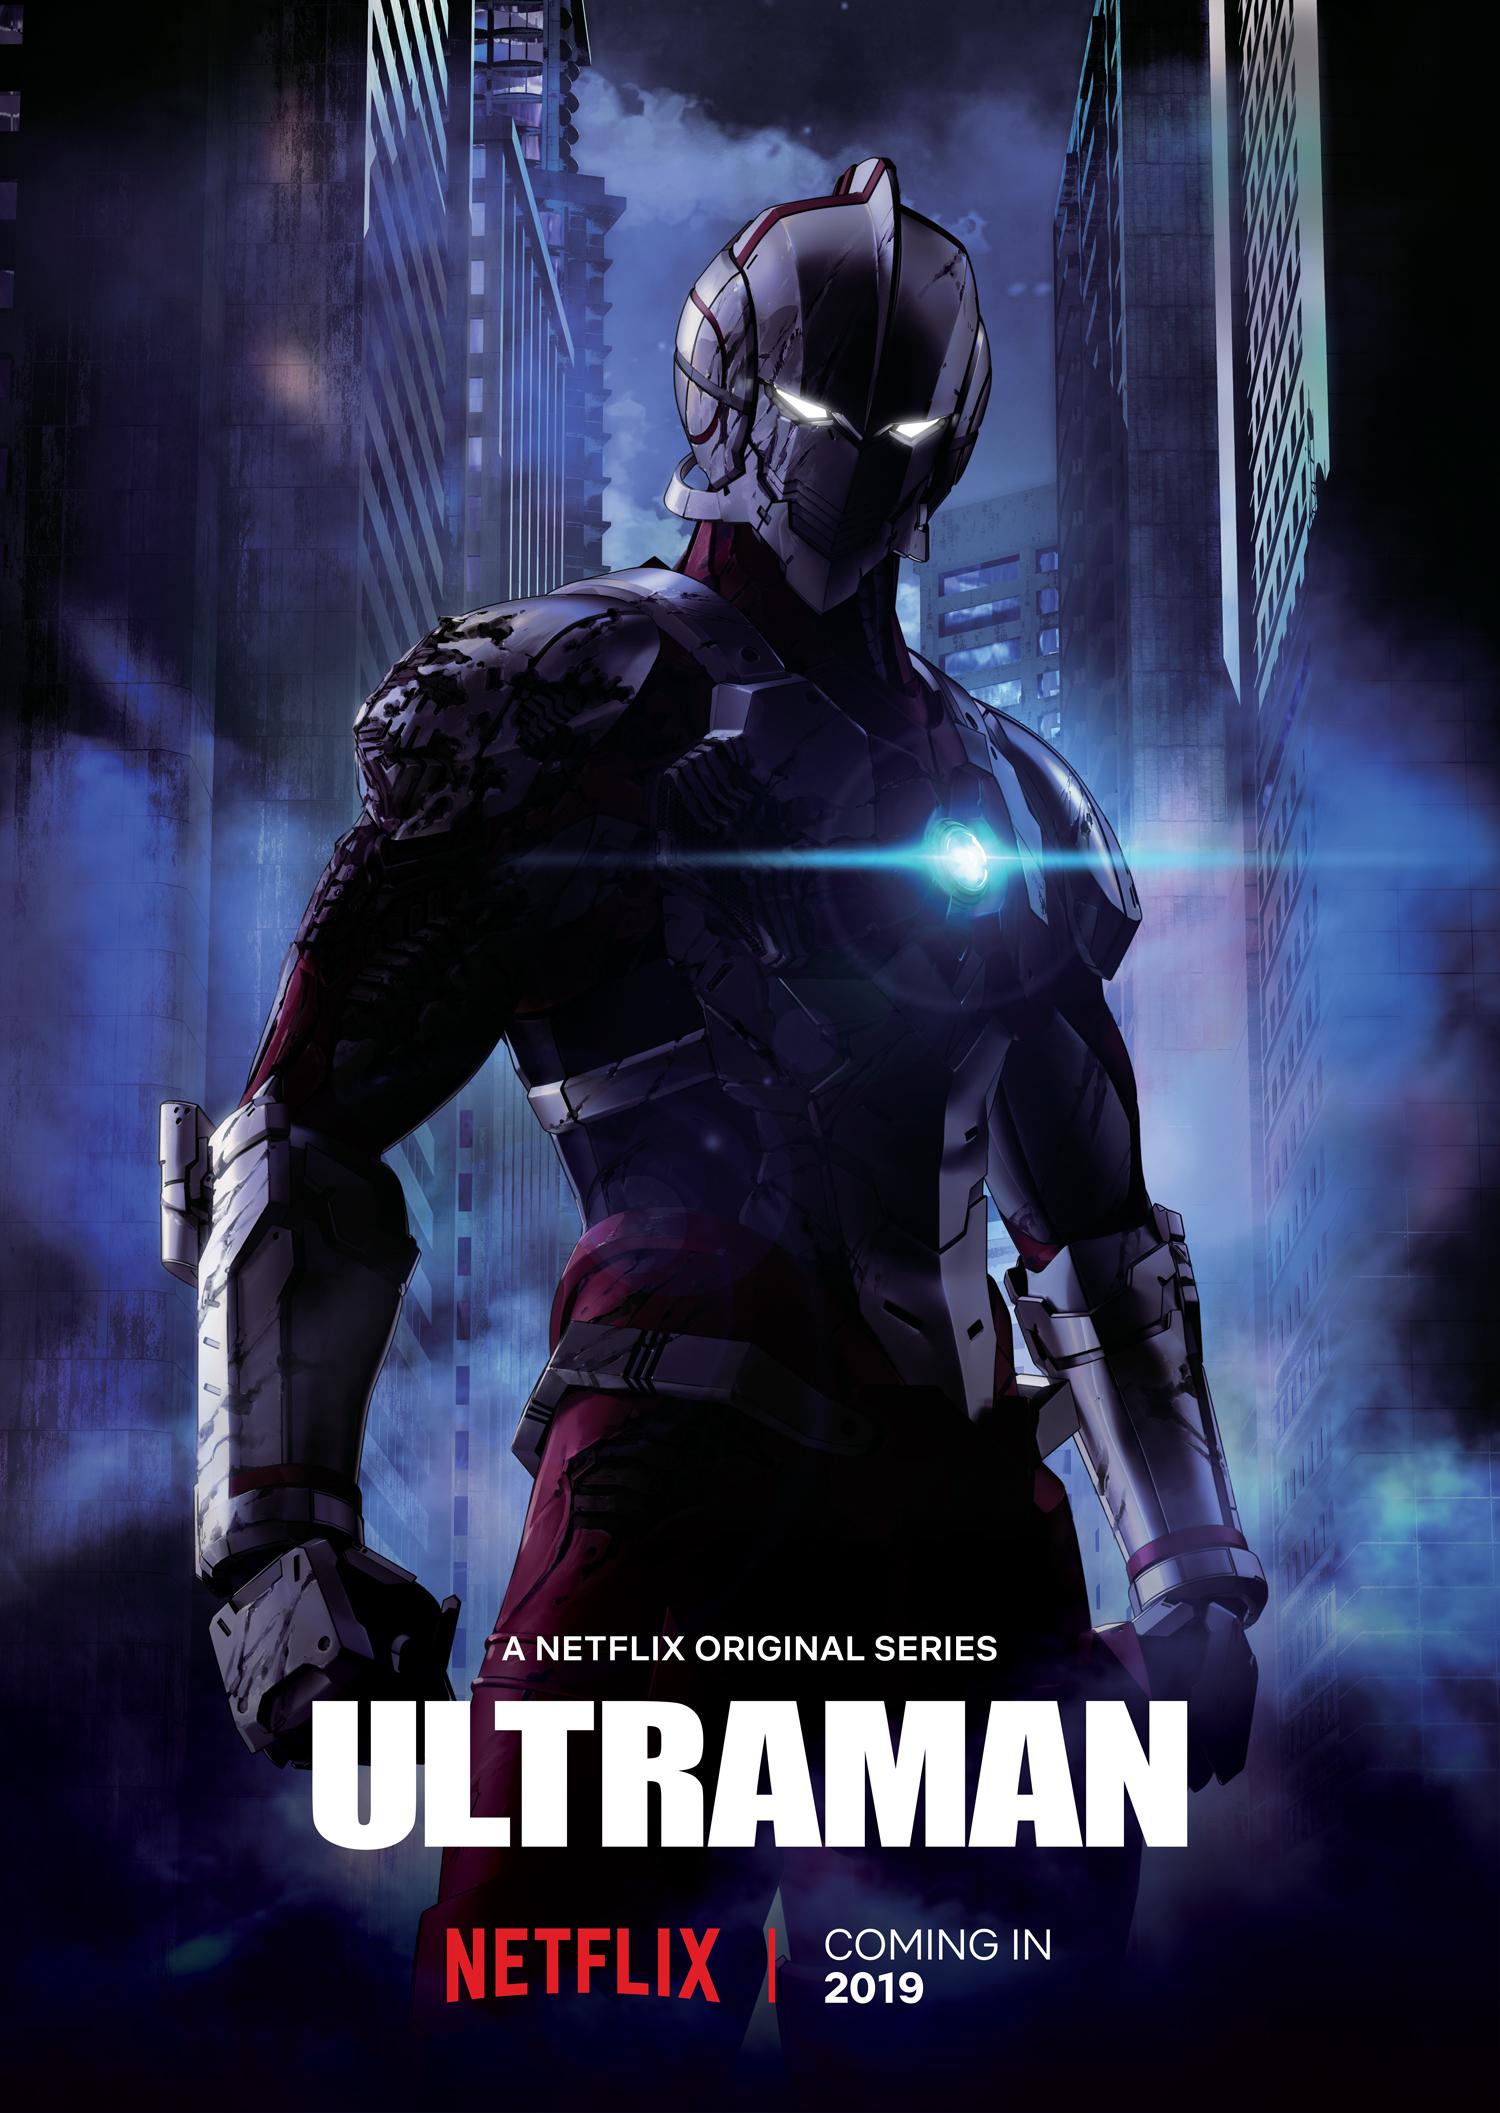 Key art for Netflix's upcoming anime series 'Ultraman'